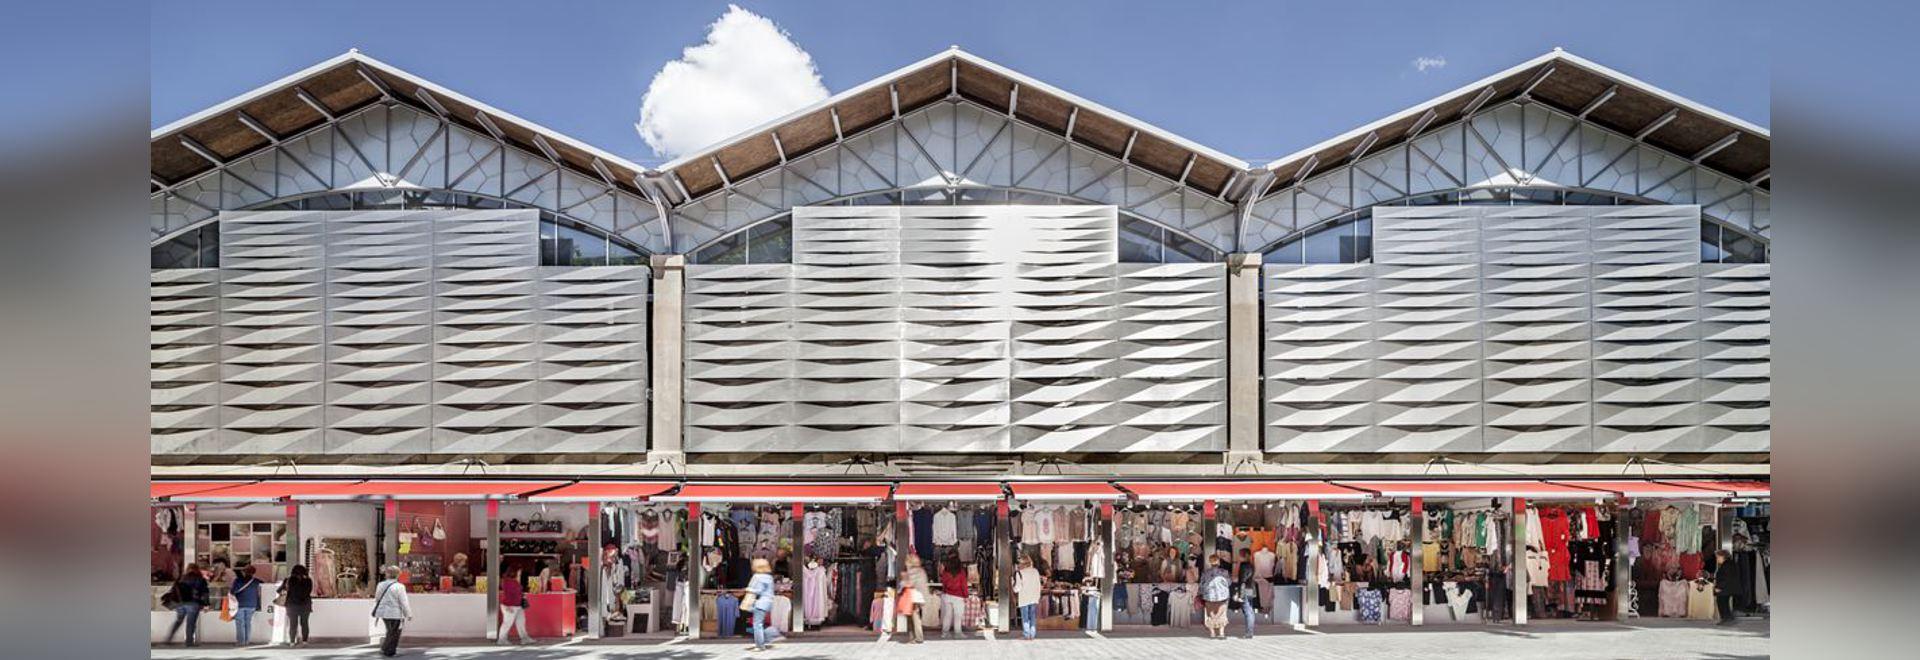 Ninot Market